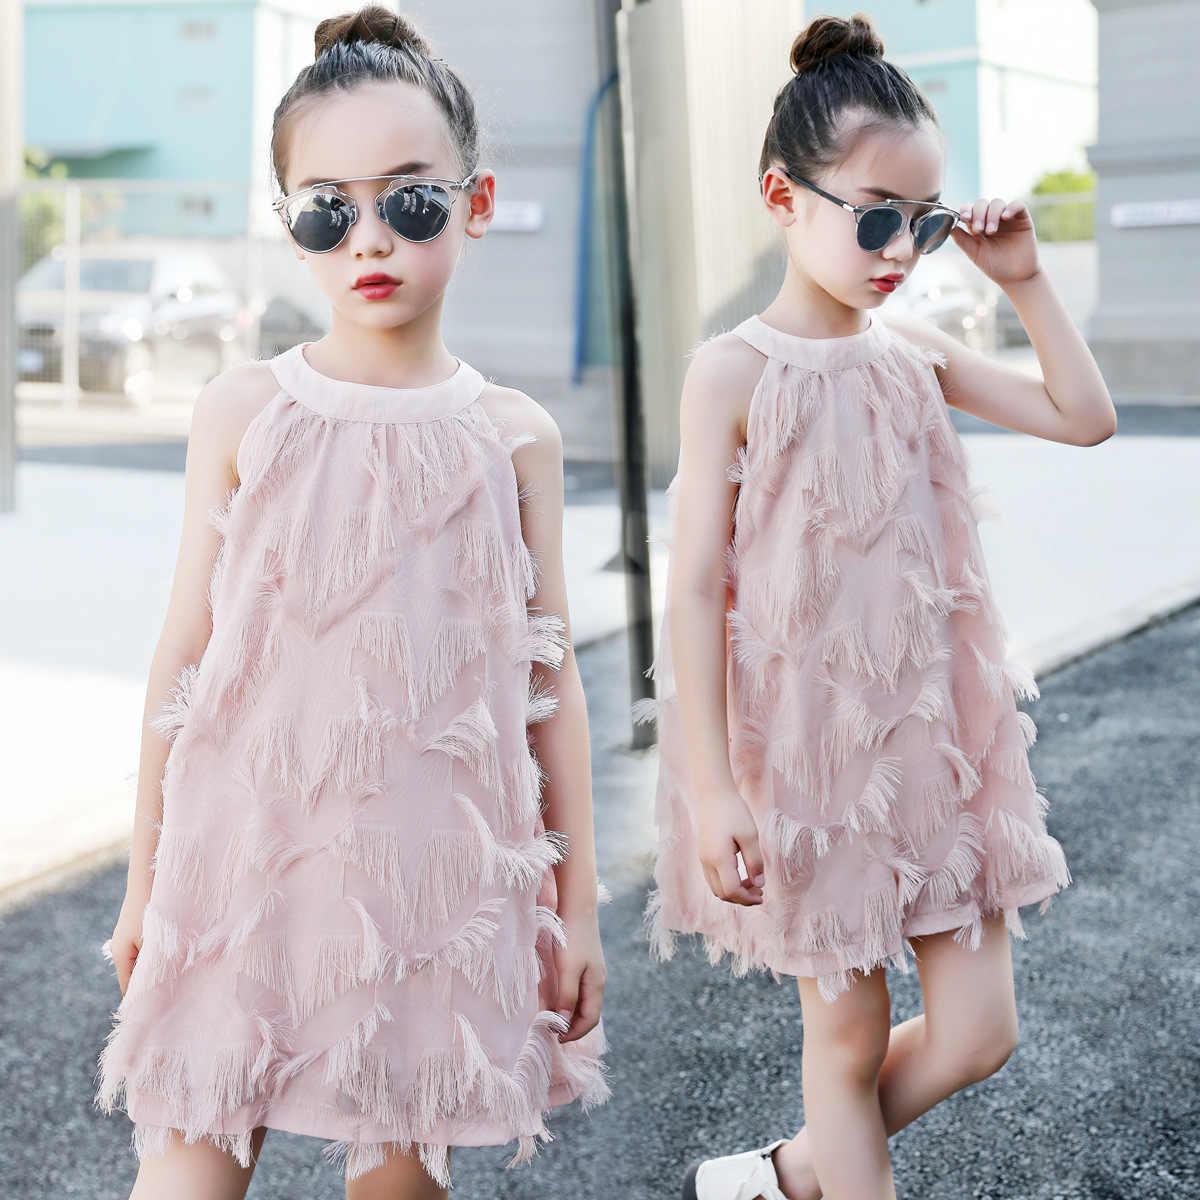 b3a469bf79 elegant princess tassel lace pink dress 4- 14 teenage girls summer clothes  kids children 2019 new big girls cool beach dresses